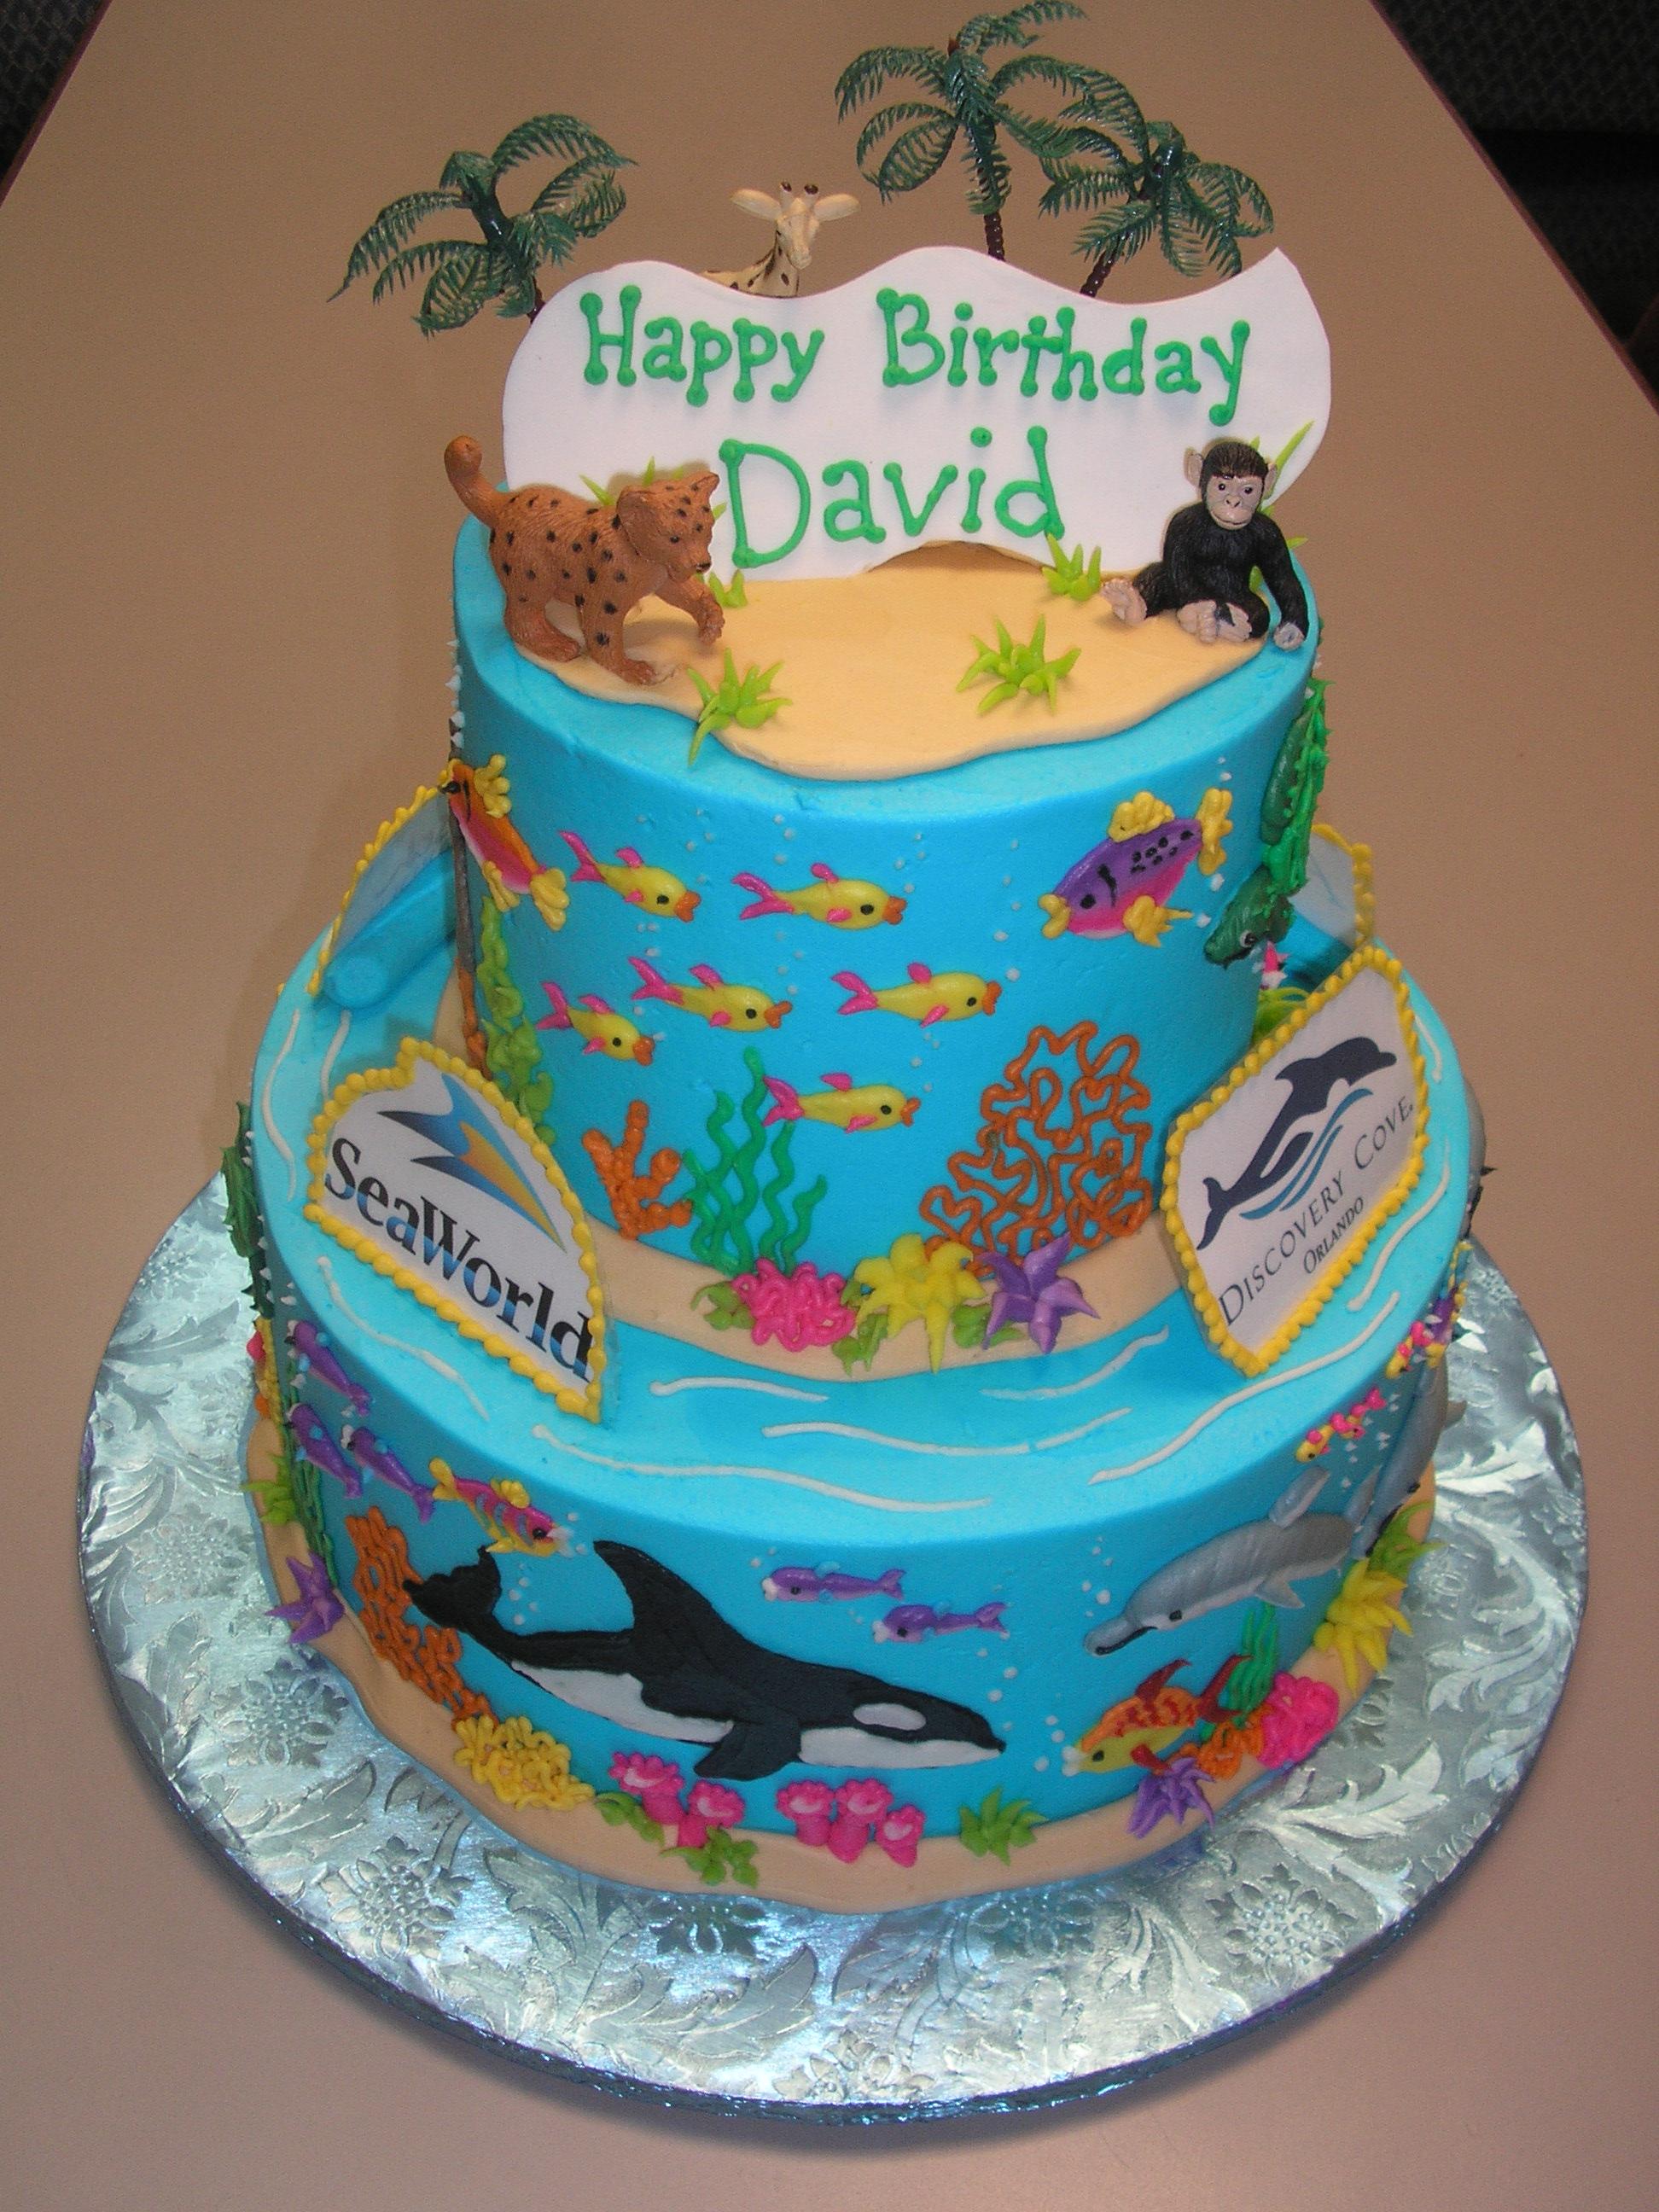 Two Tier SeaWorld cake